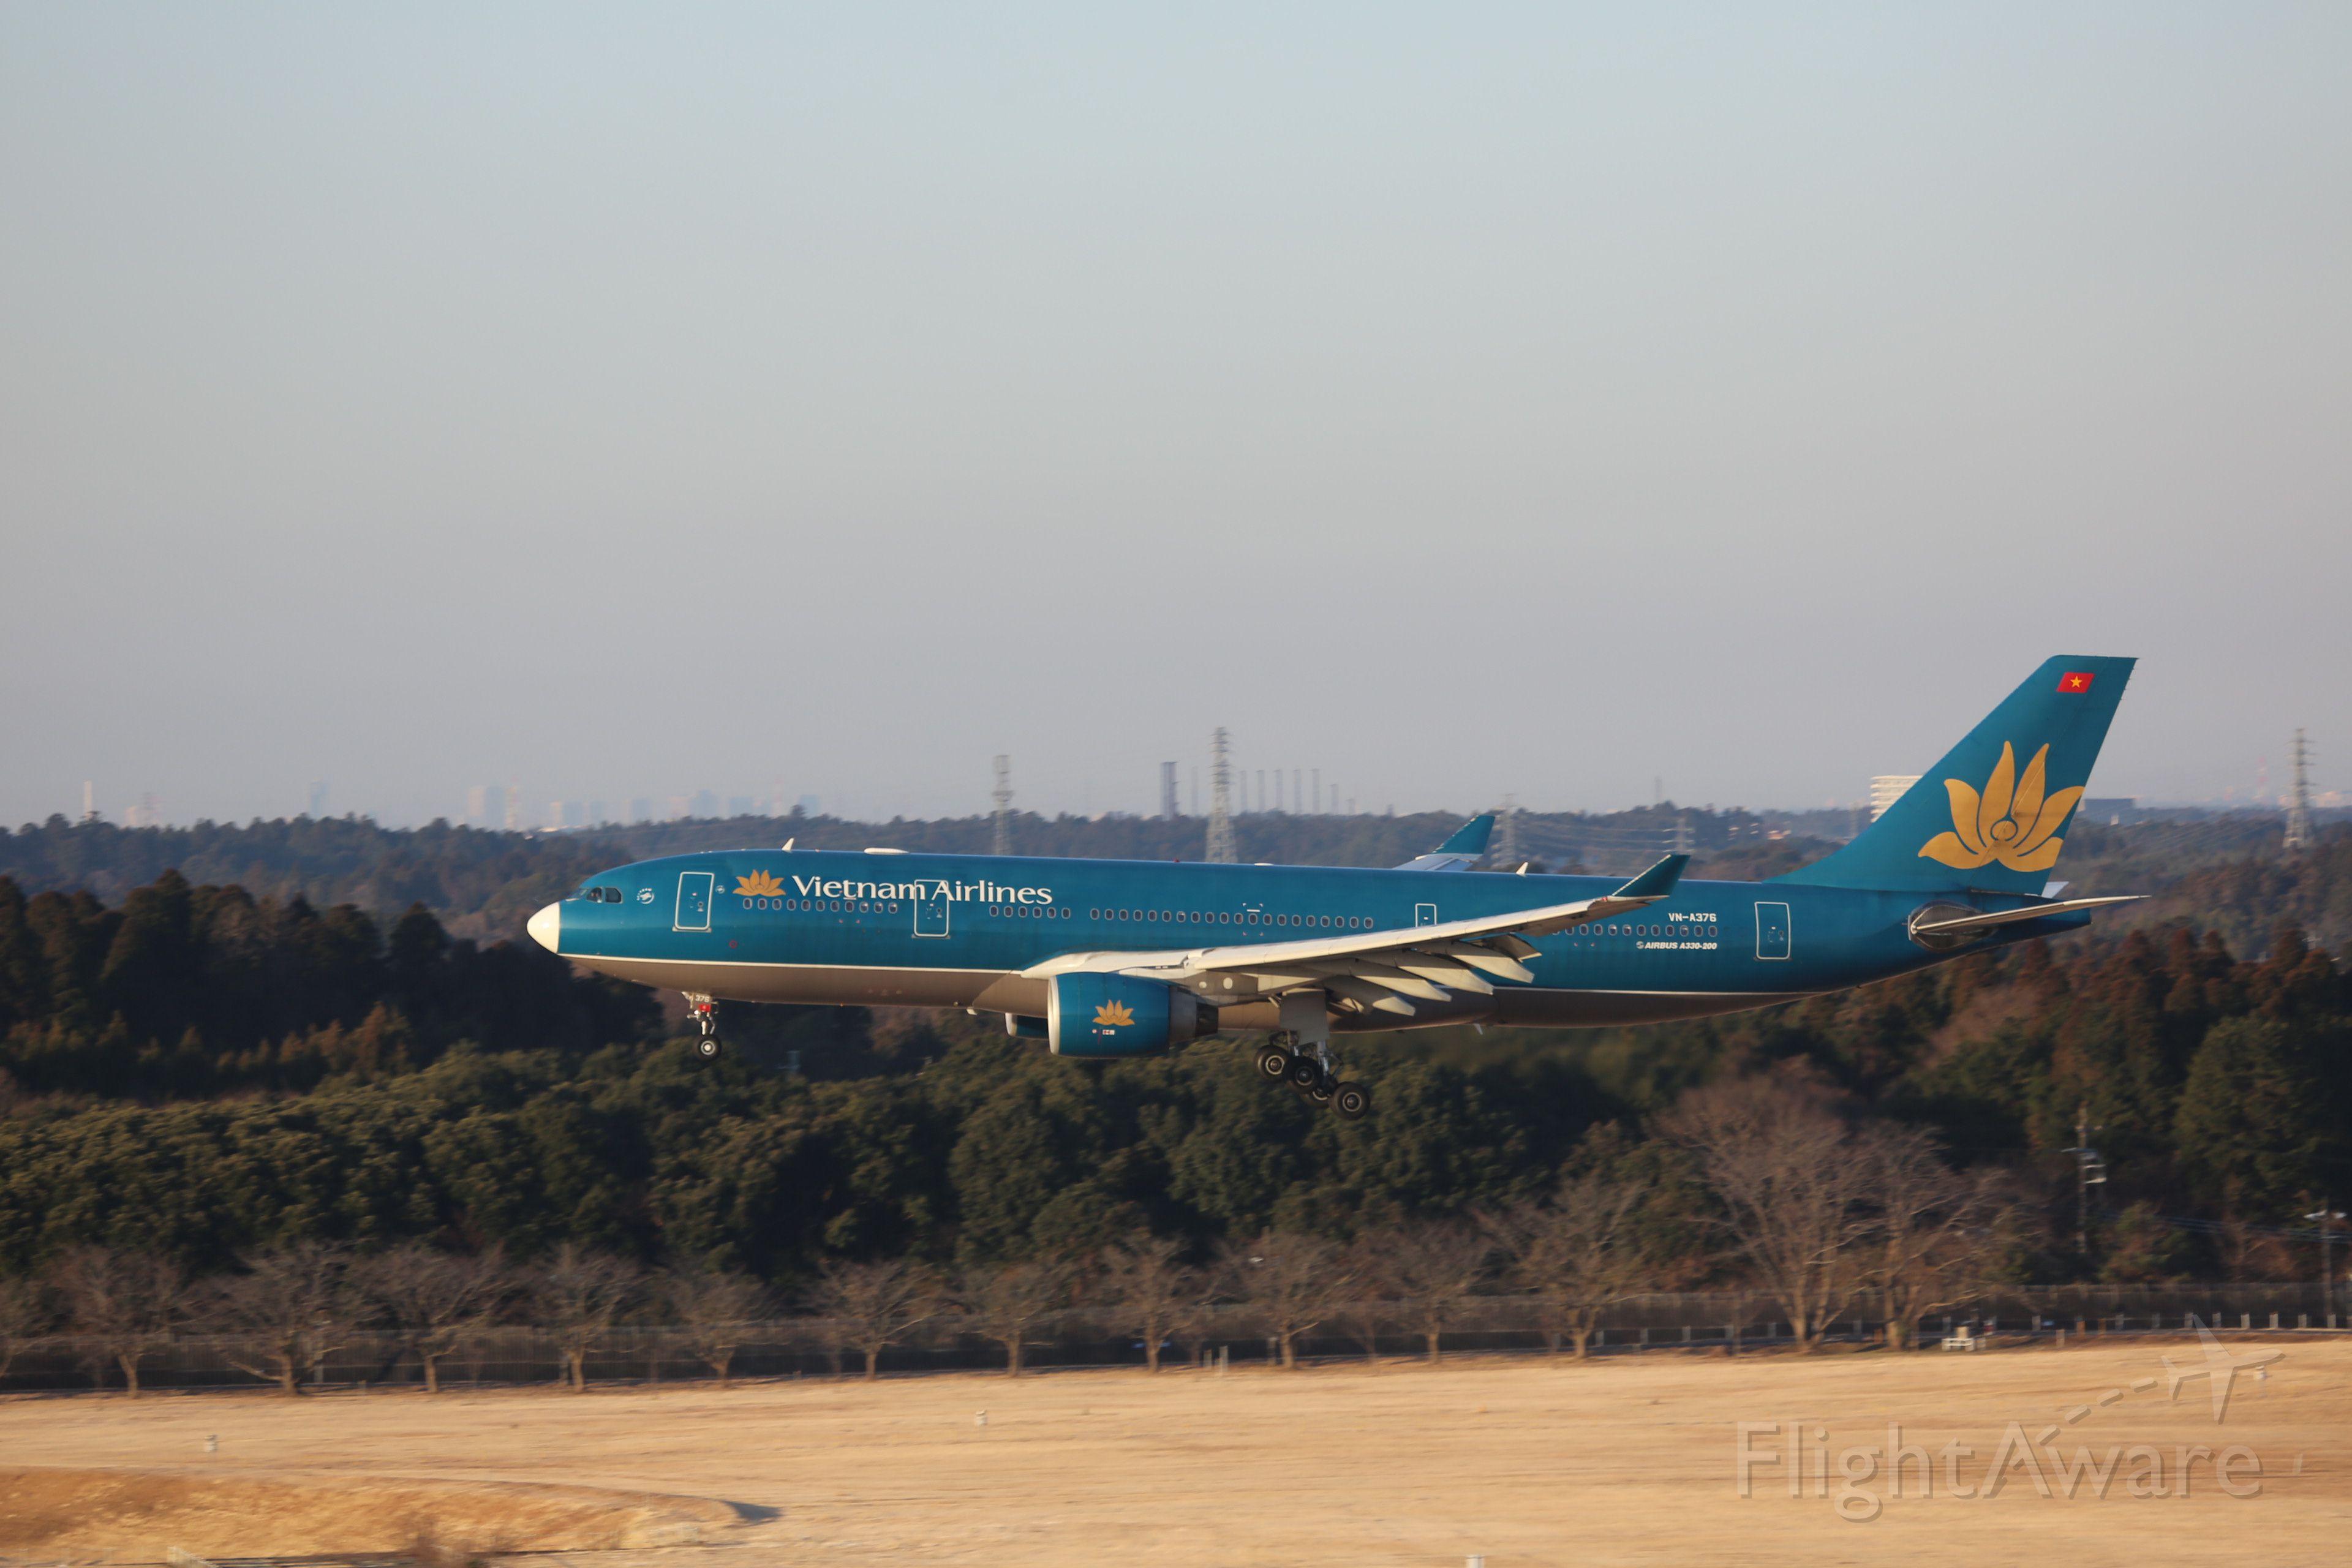 Airbus A330-200 (VNA376)